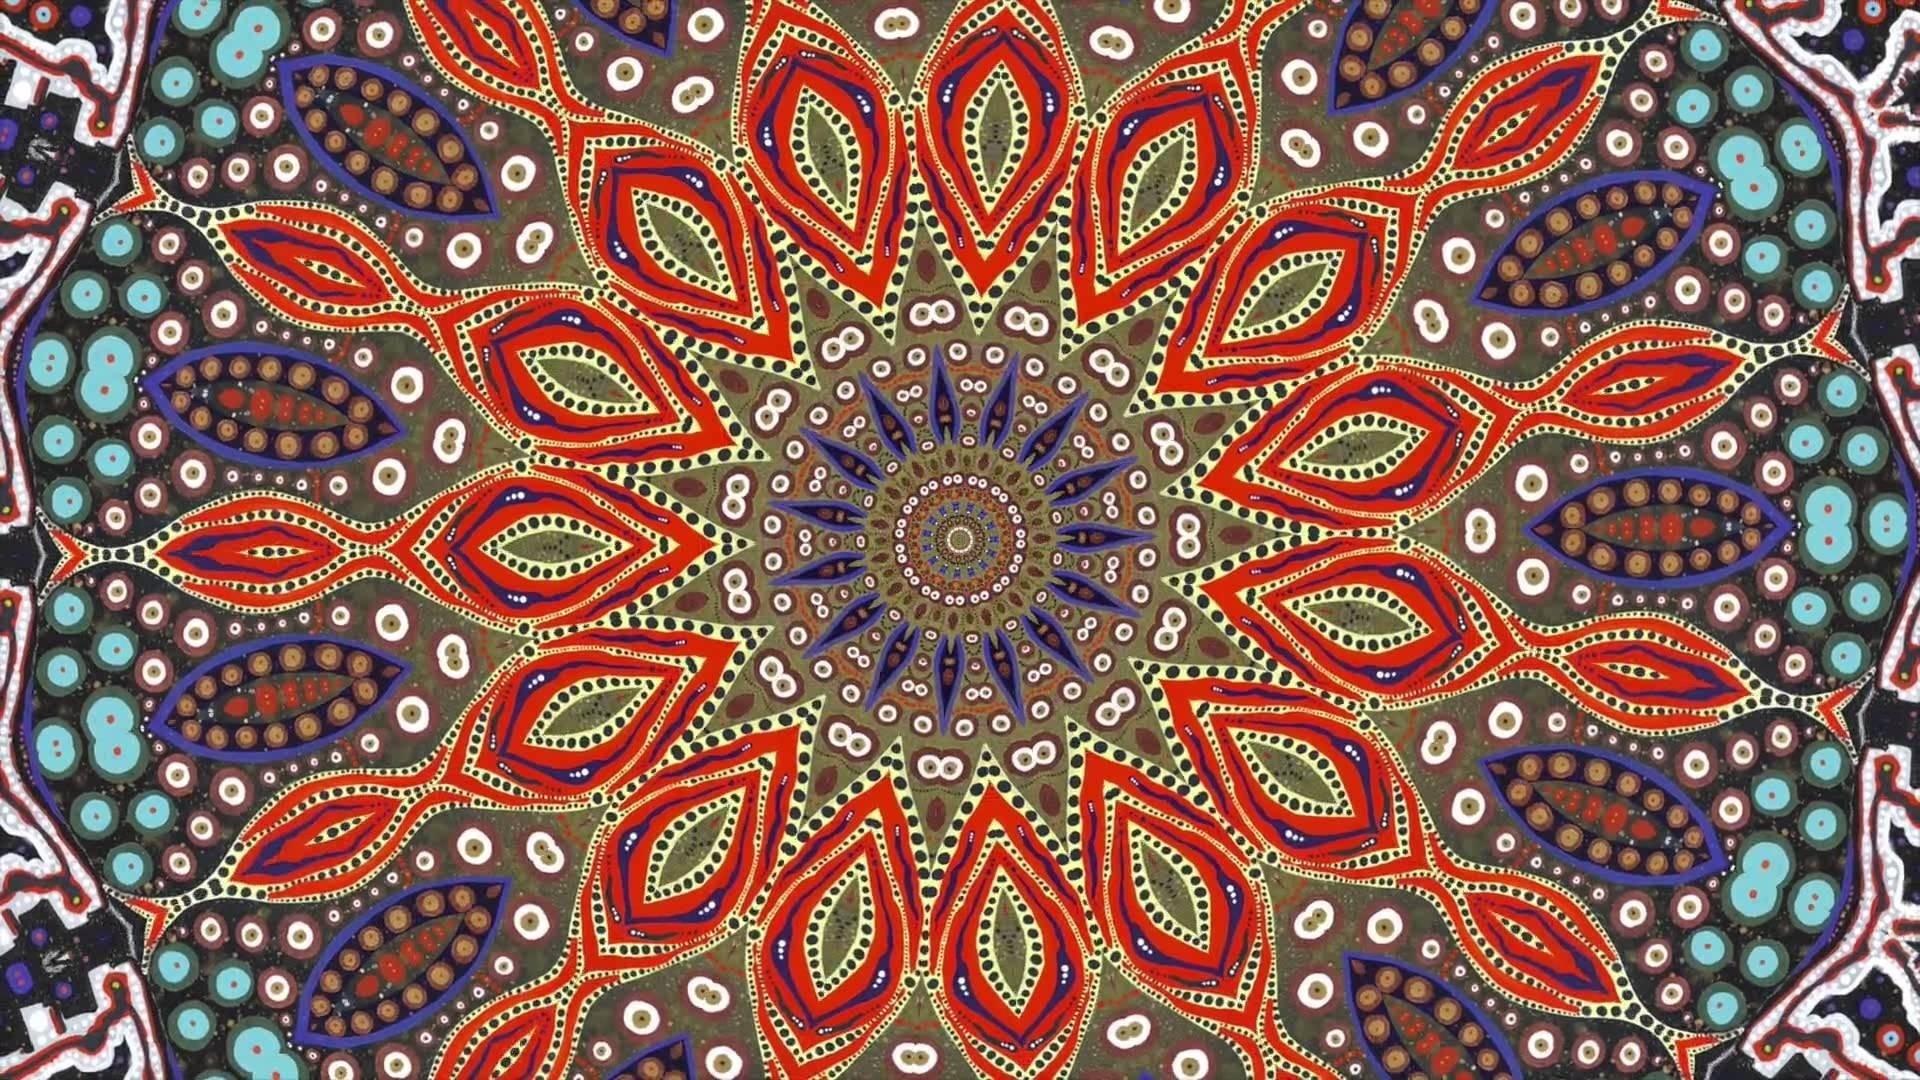 Mandala Free Wallpaper and Background